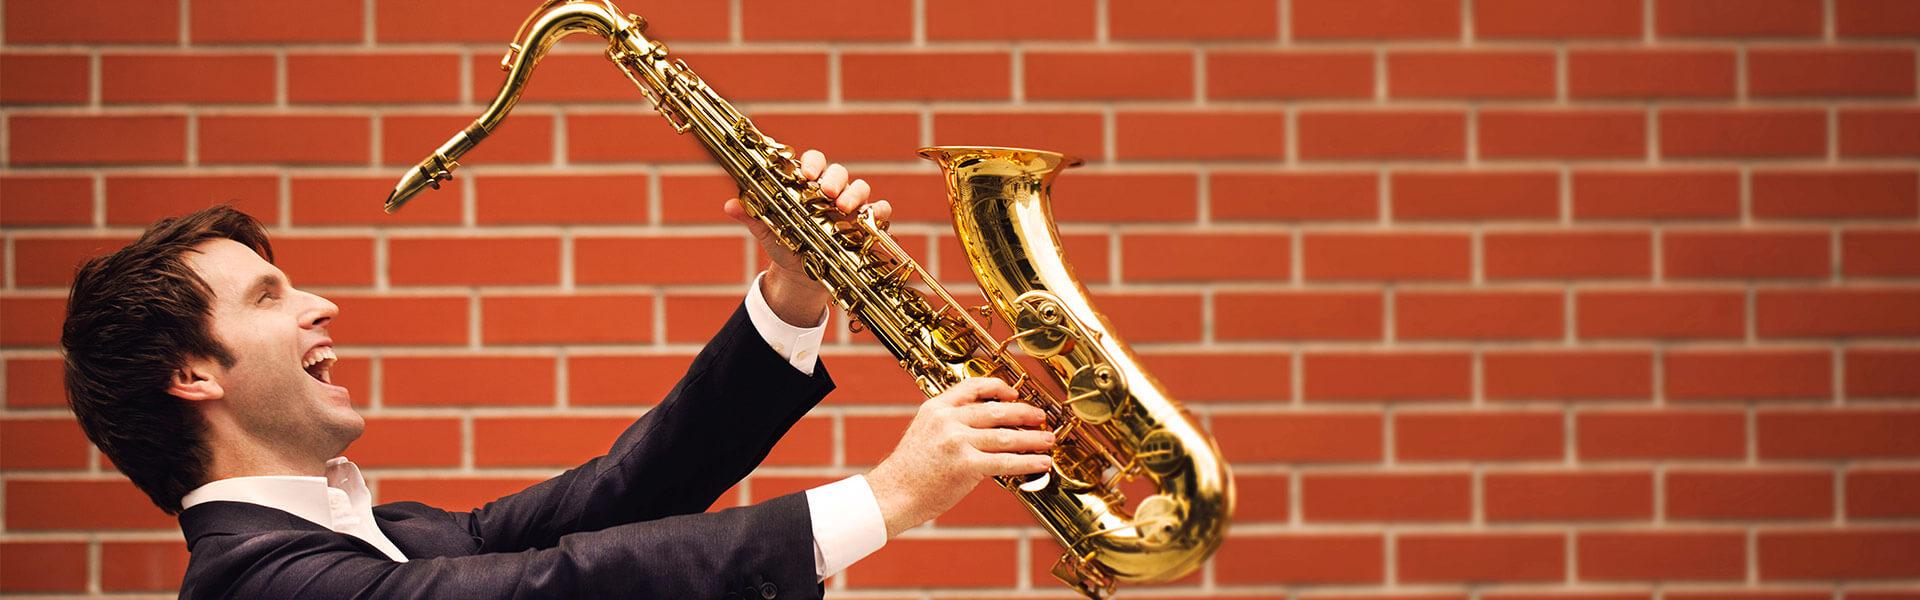 https://www.berlinklang.de/wp-content/uploads/2018/06/saenger-saxophonist-buchen-berlin-1.jpg